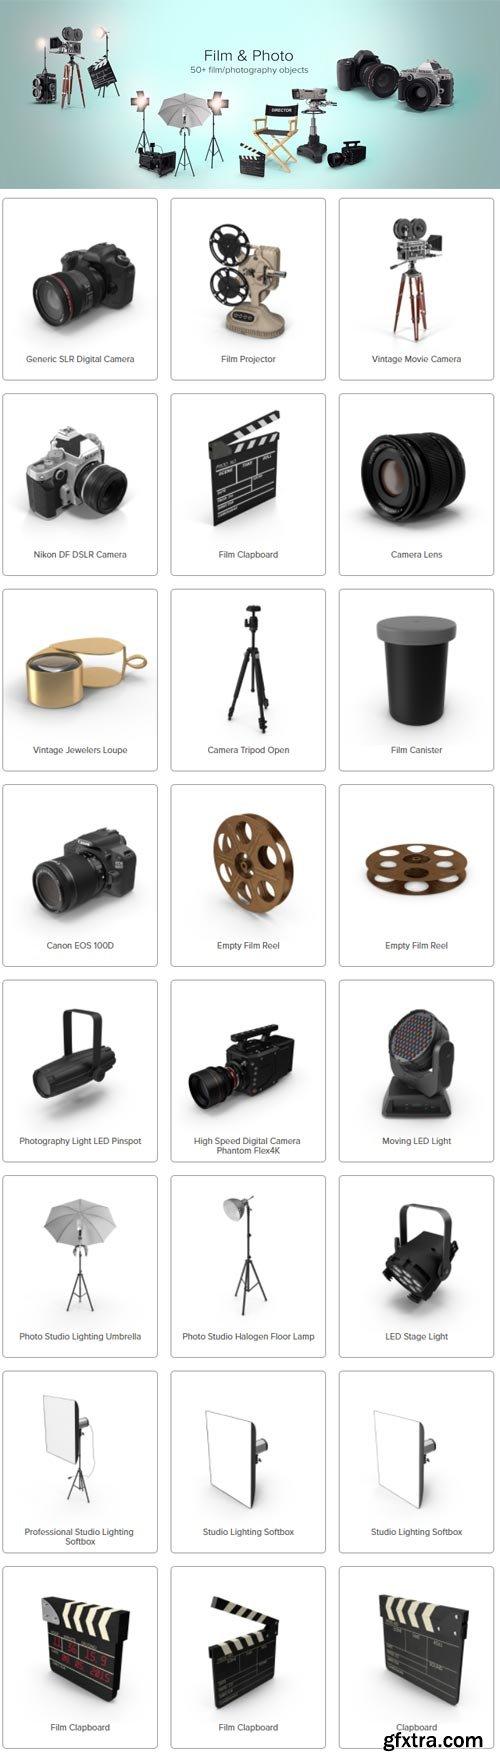 PixelSquid - Film & Photo Collection